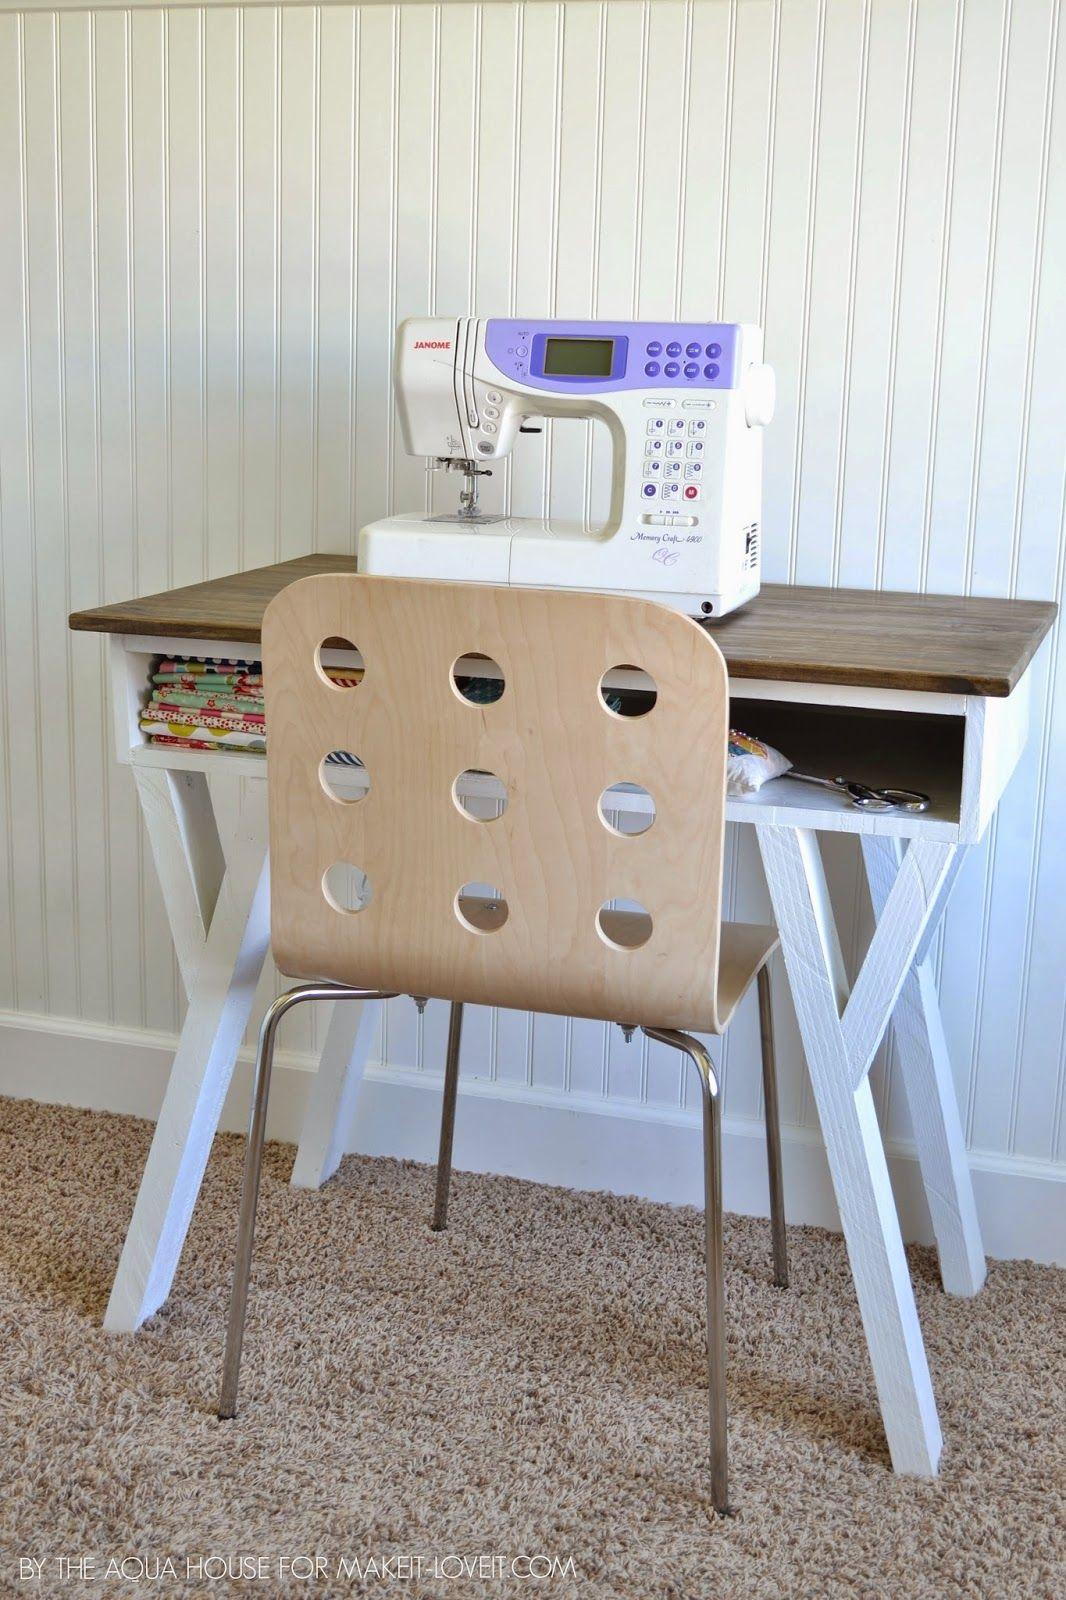 Diy farmhouse modern deskwith open front storage cubby